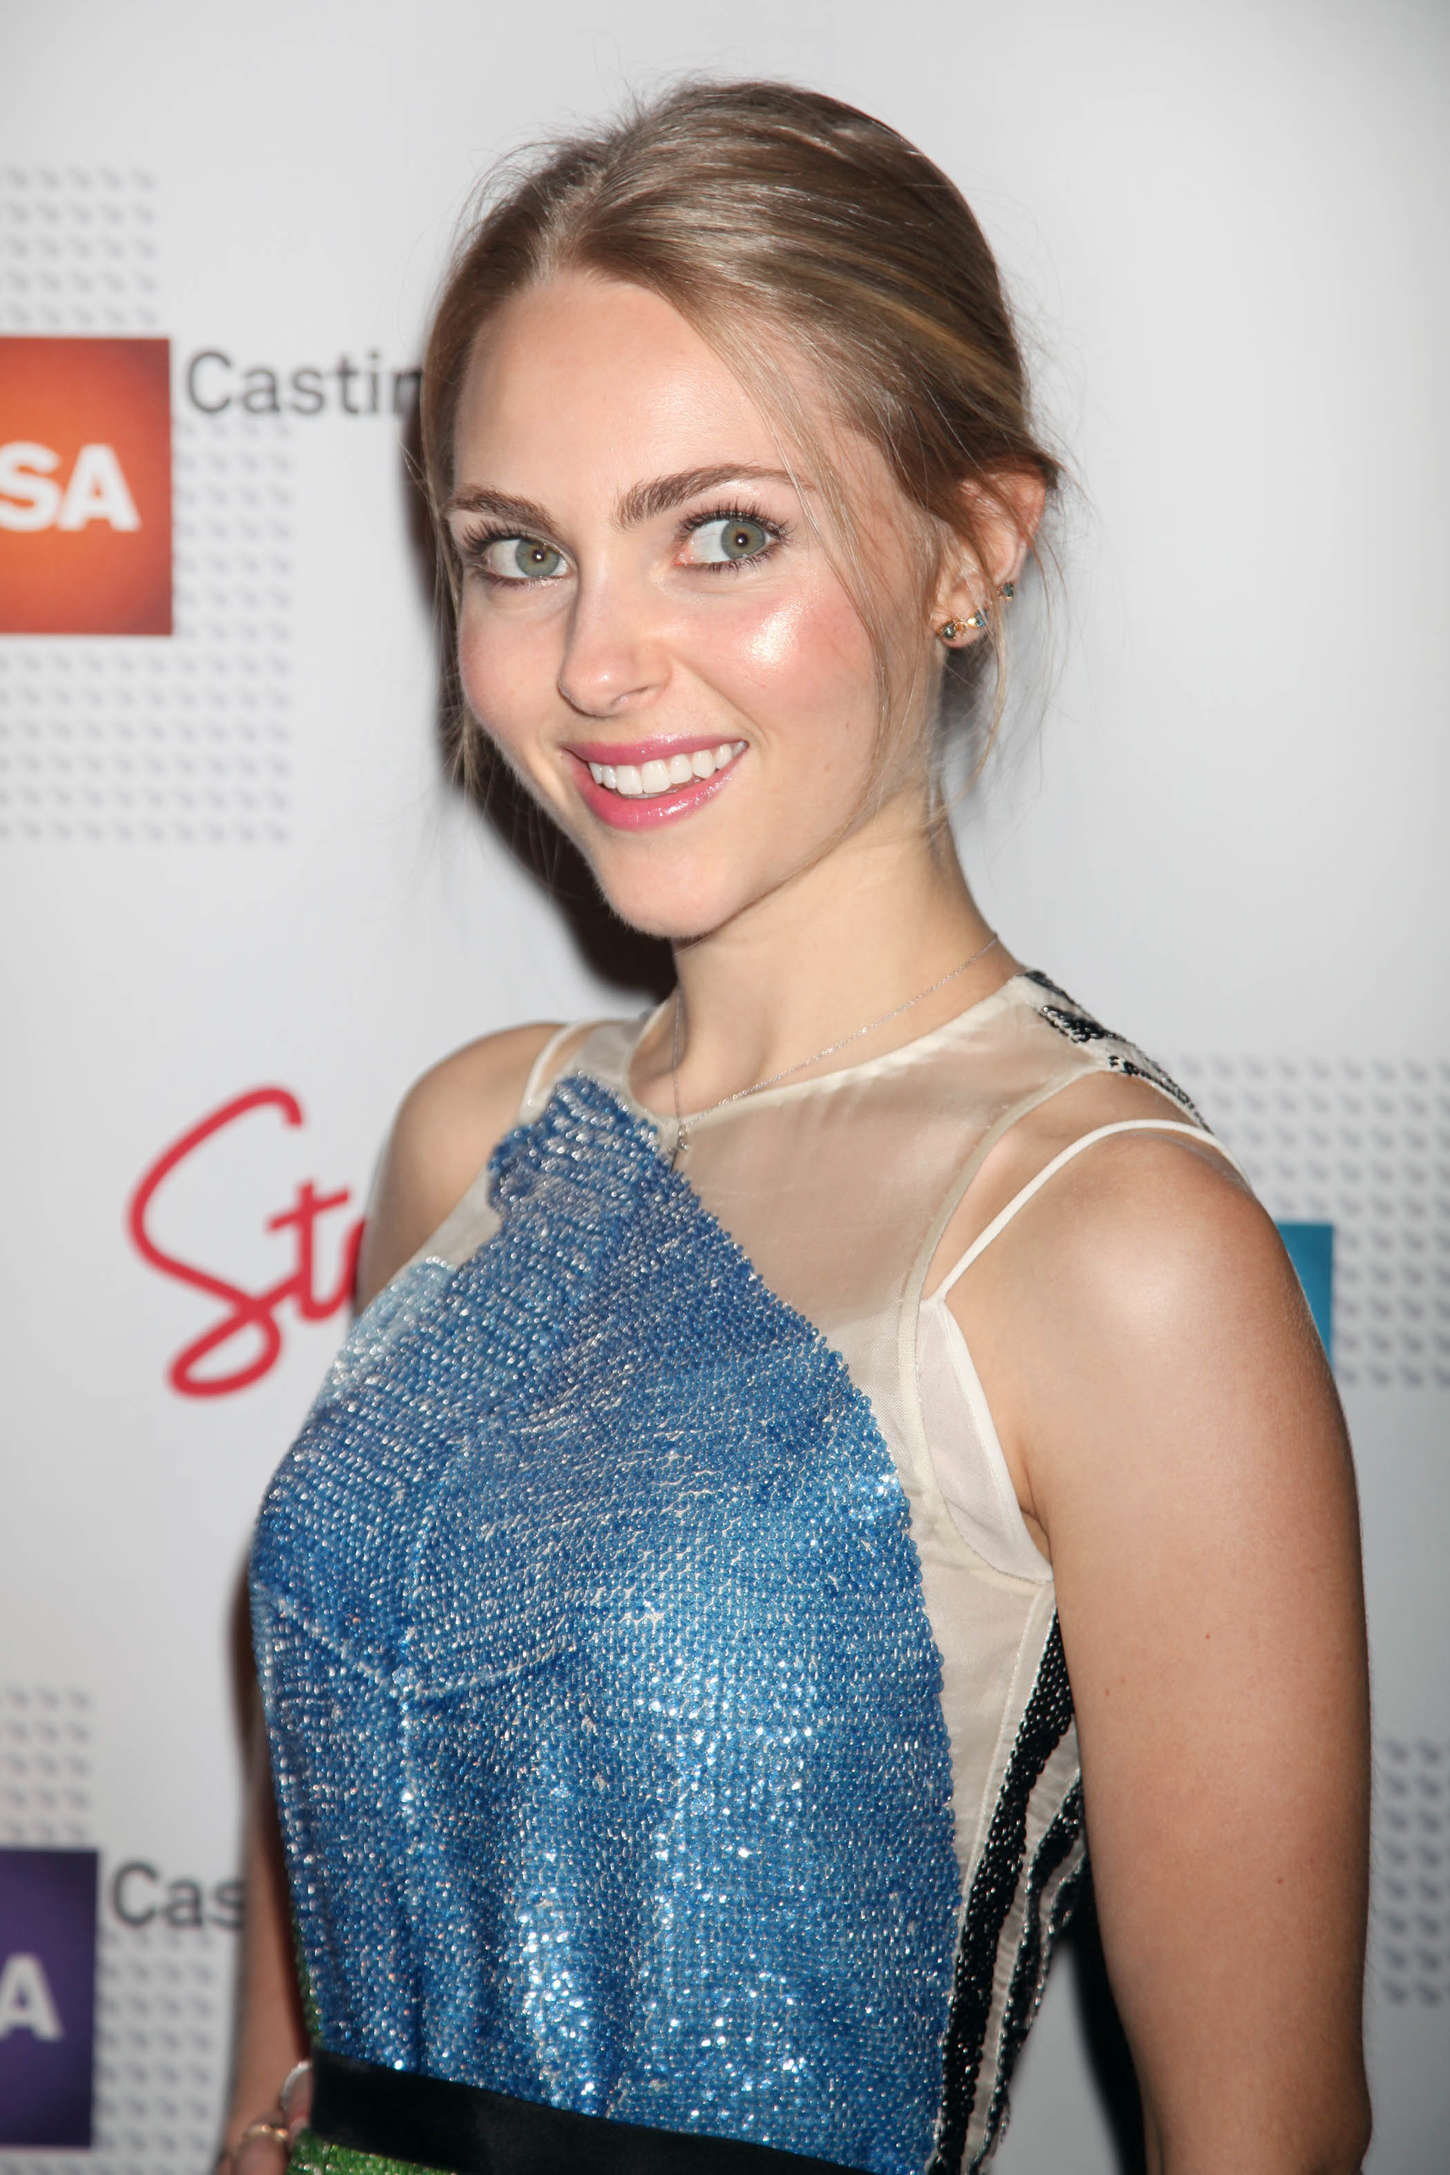 AnnaSophia Robb - 30th Annual Artios Awards for Casting in NY - GotCeleb